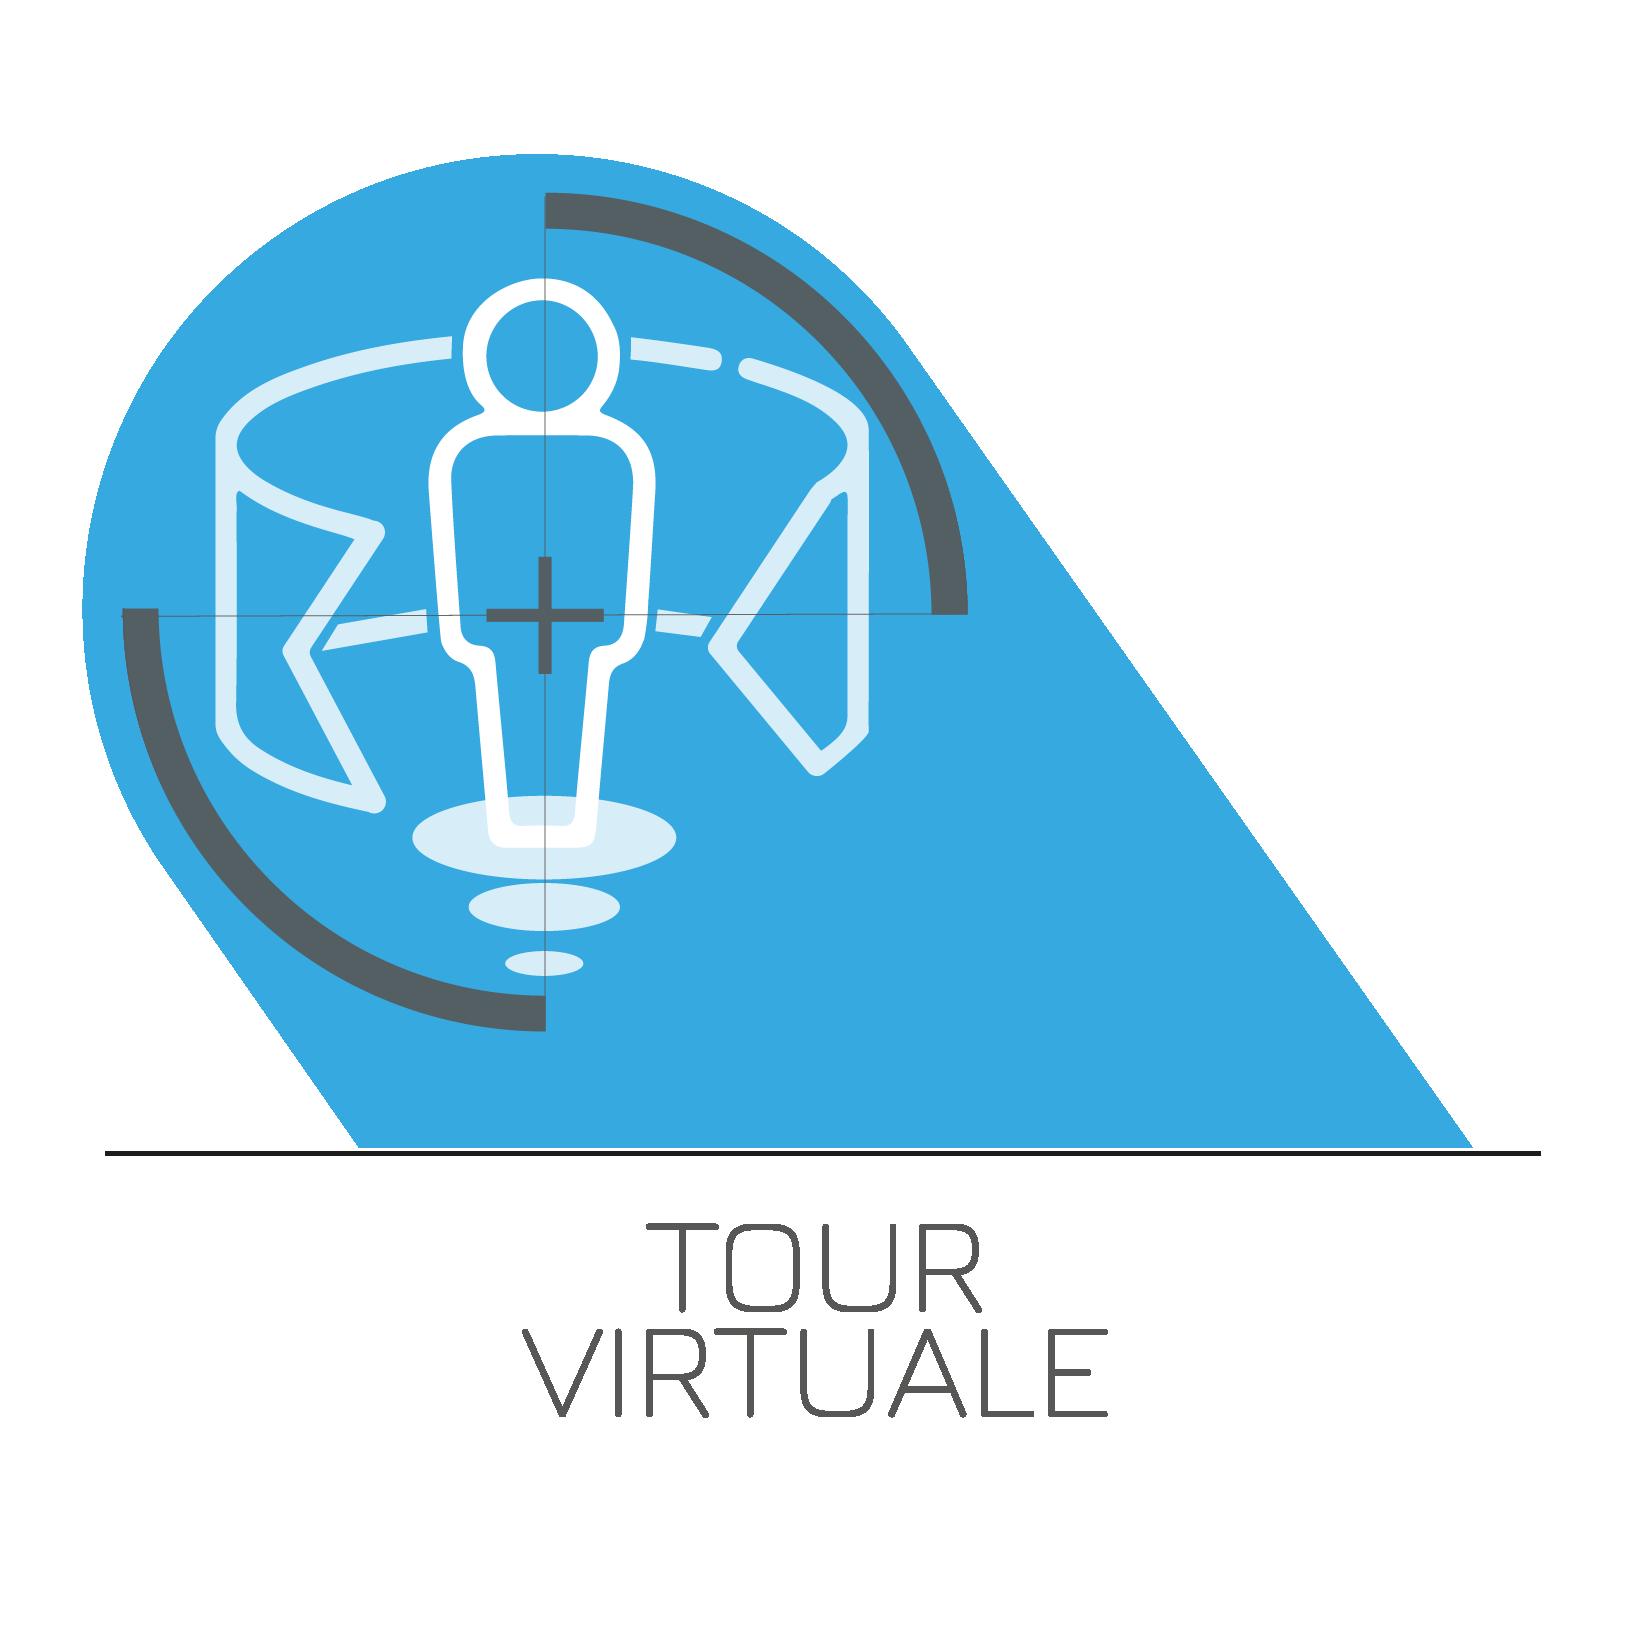 Tour virtuale nel patrimonio culturale